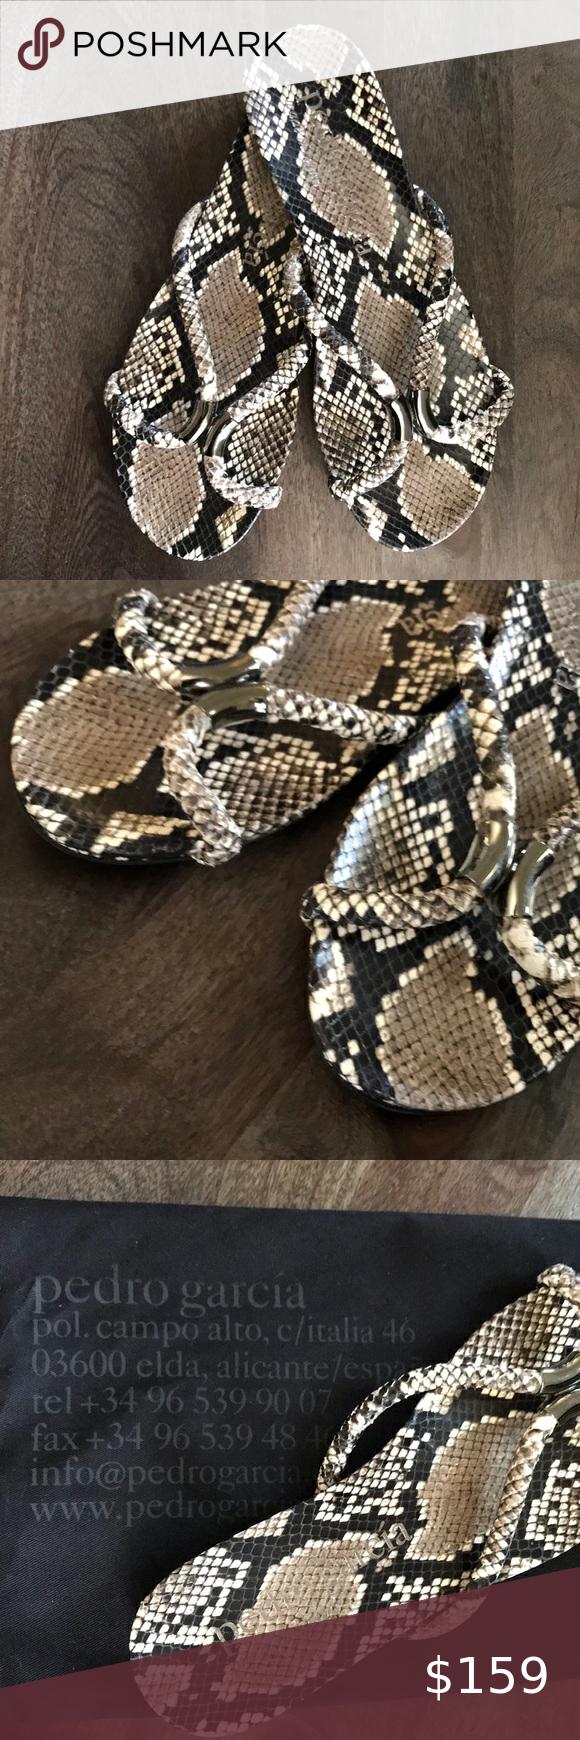 Pedro Garcia Snake Print Sandals sz 41 NWOT Pedro Garcia Snake Print Sandals sz …